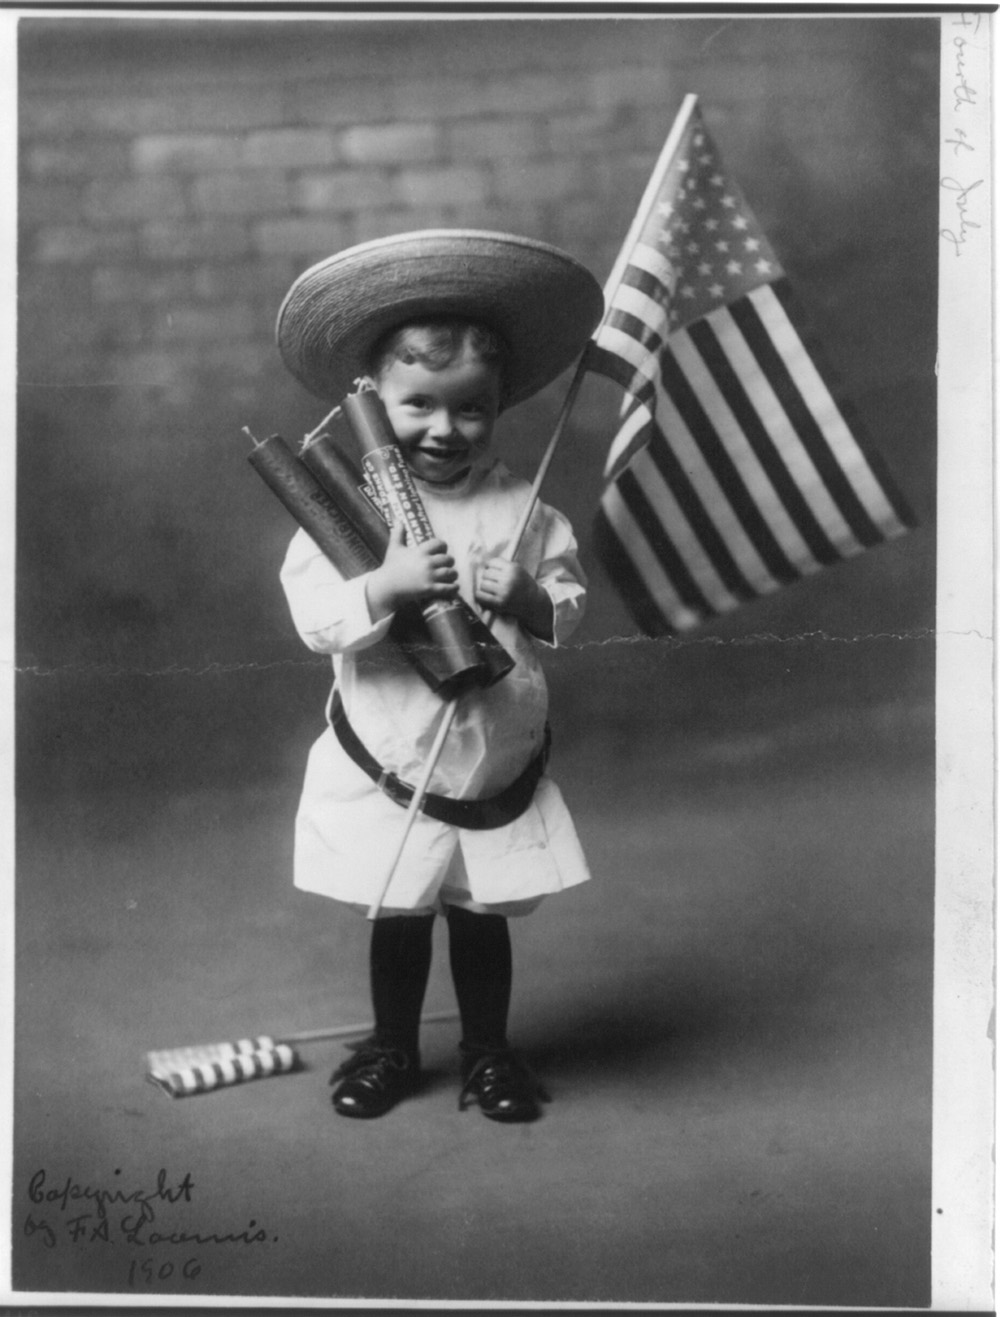 July 4.  Loumis, F. A. 1906